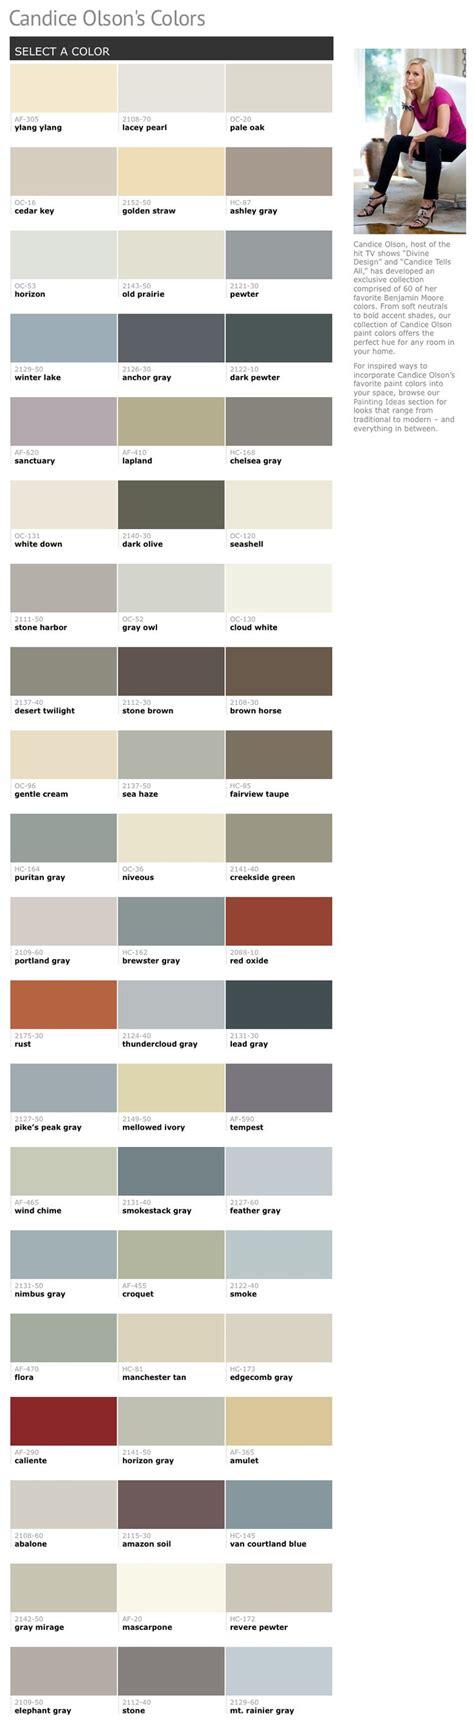 60 Of Candice Olsons Favorite Benjamin Moore Paint Colors